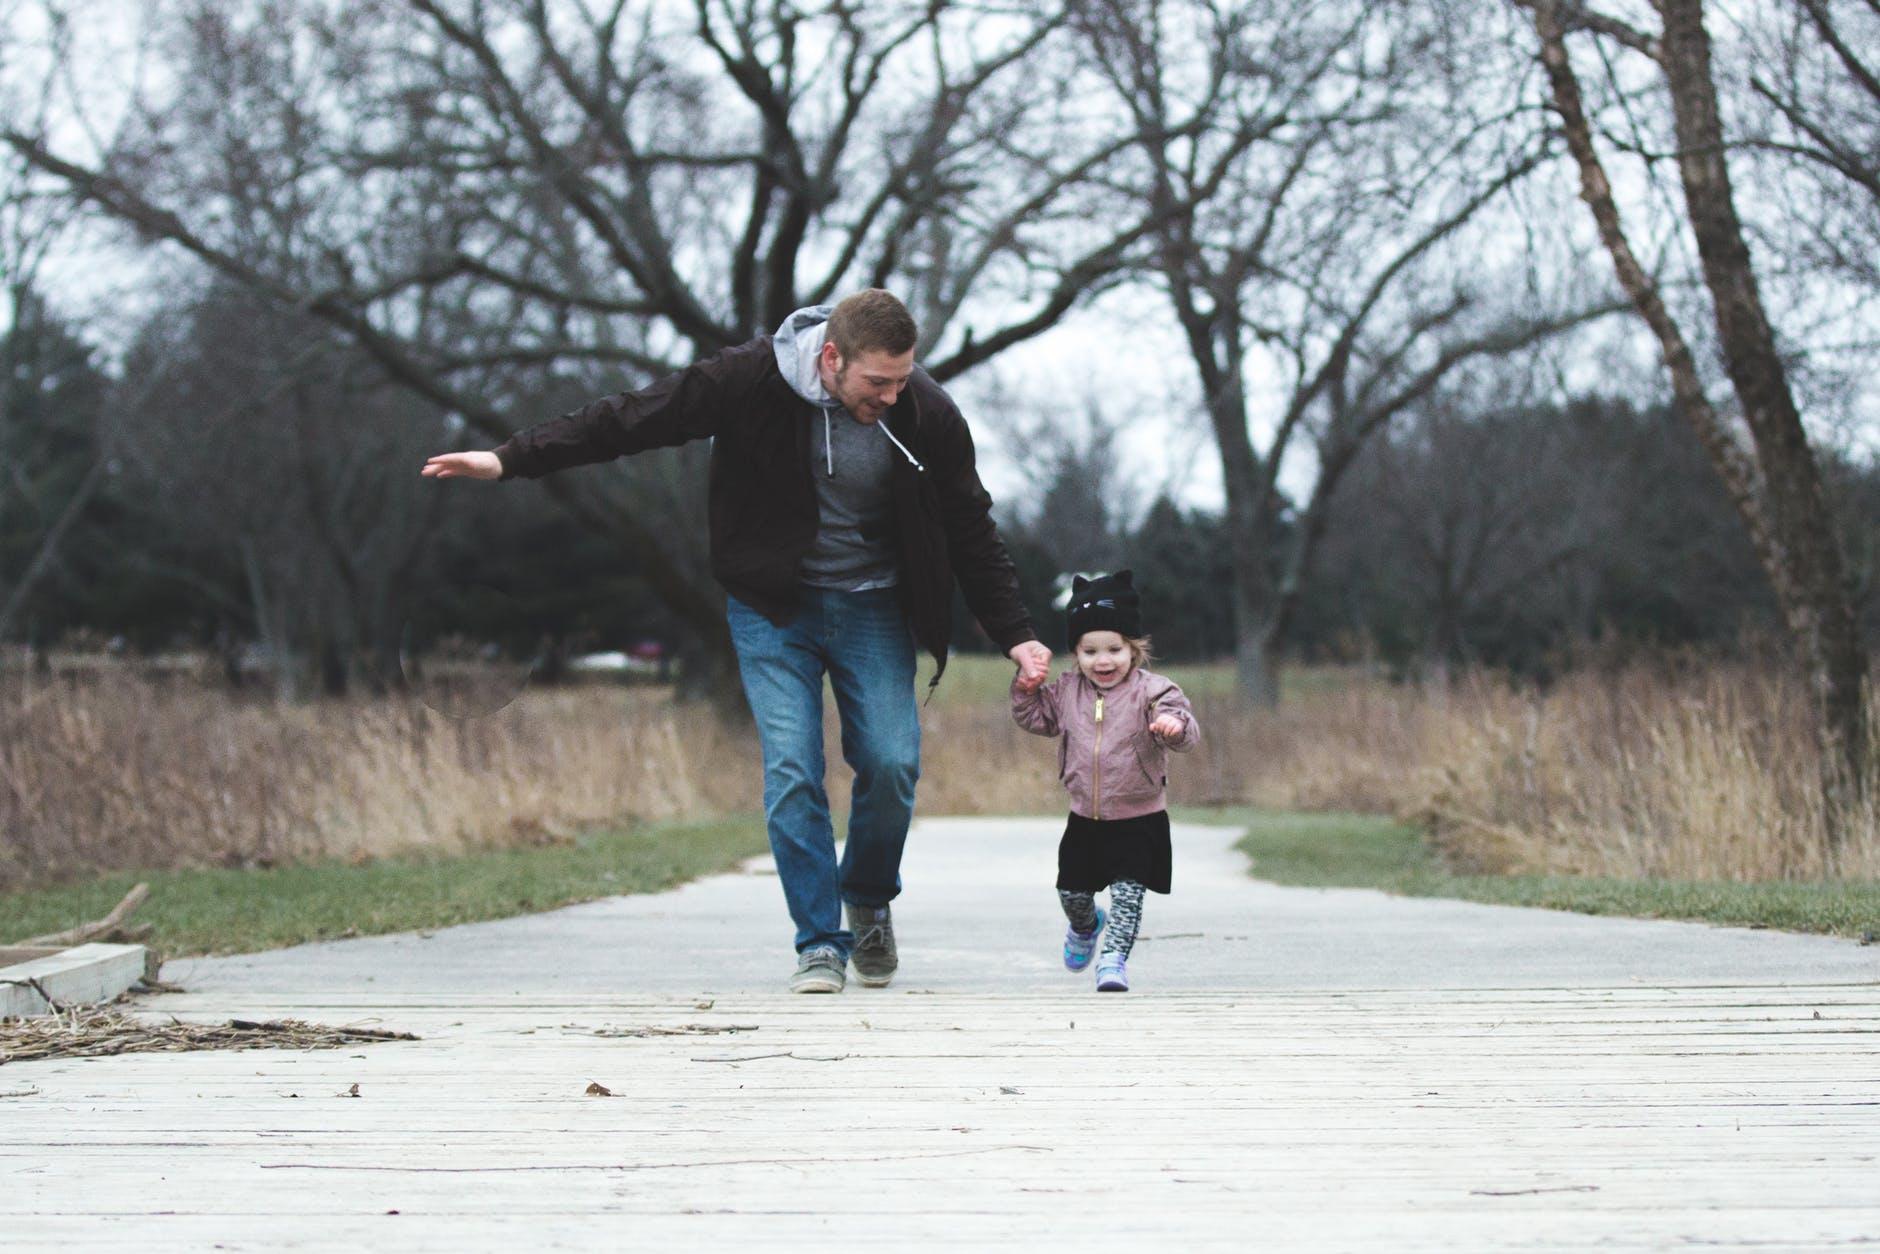 finding joy through movement